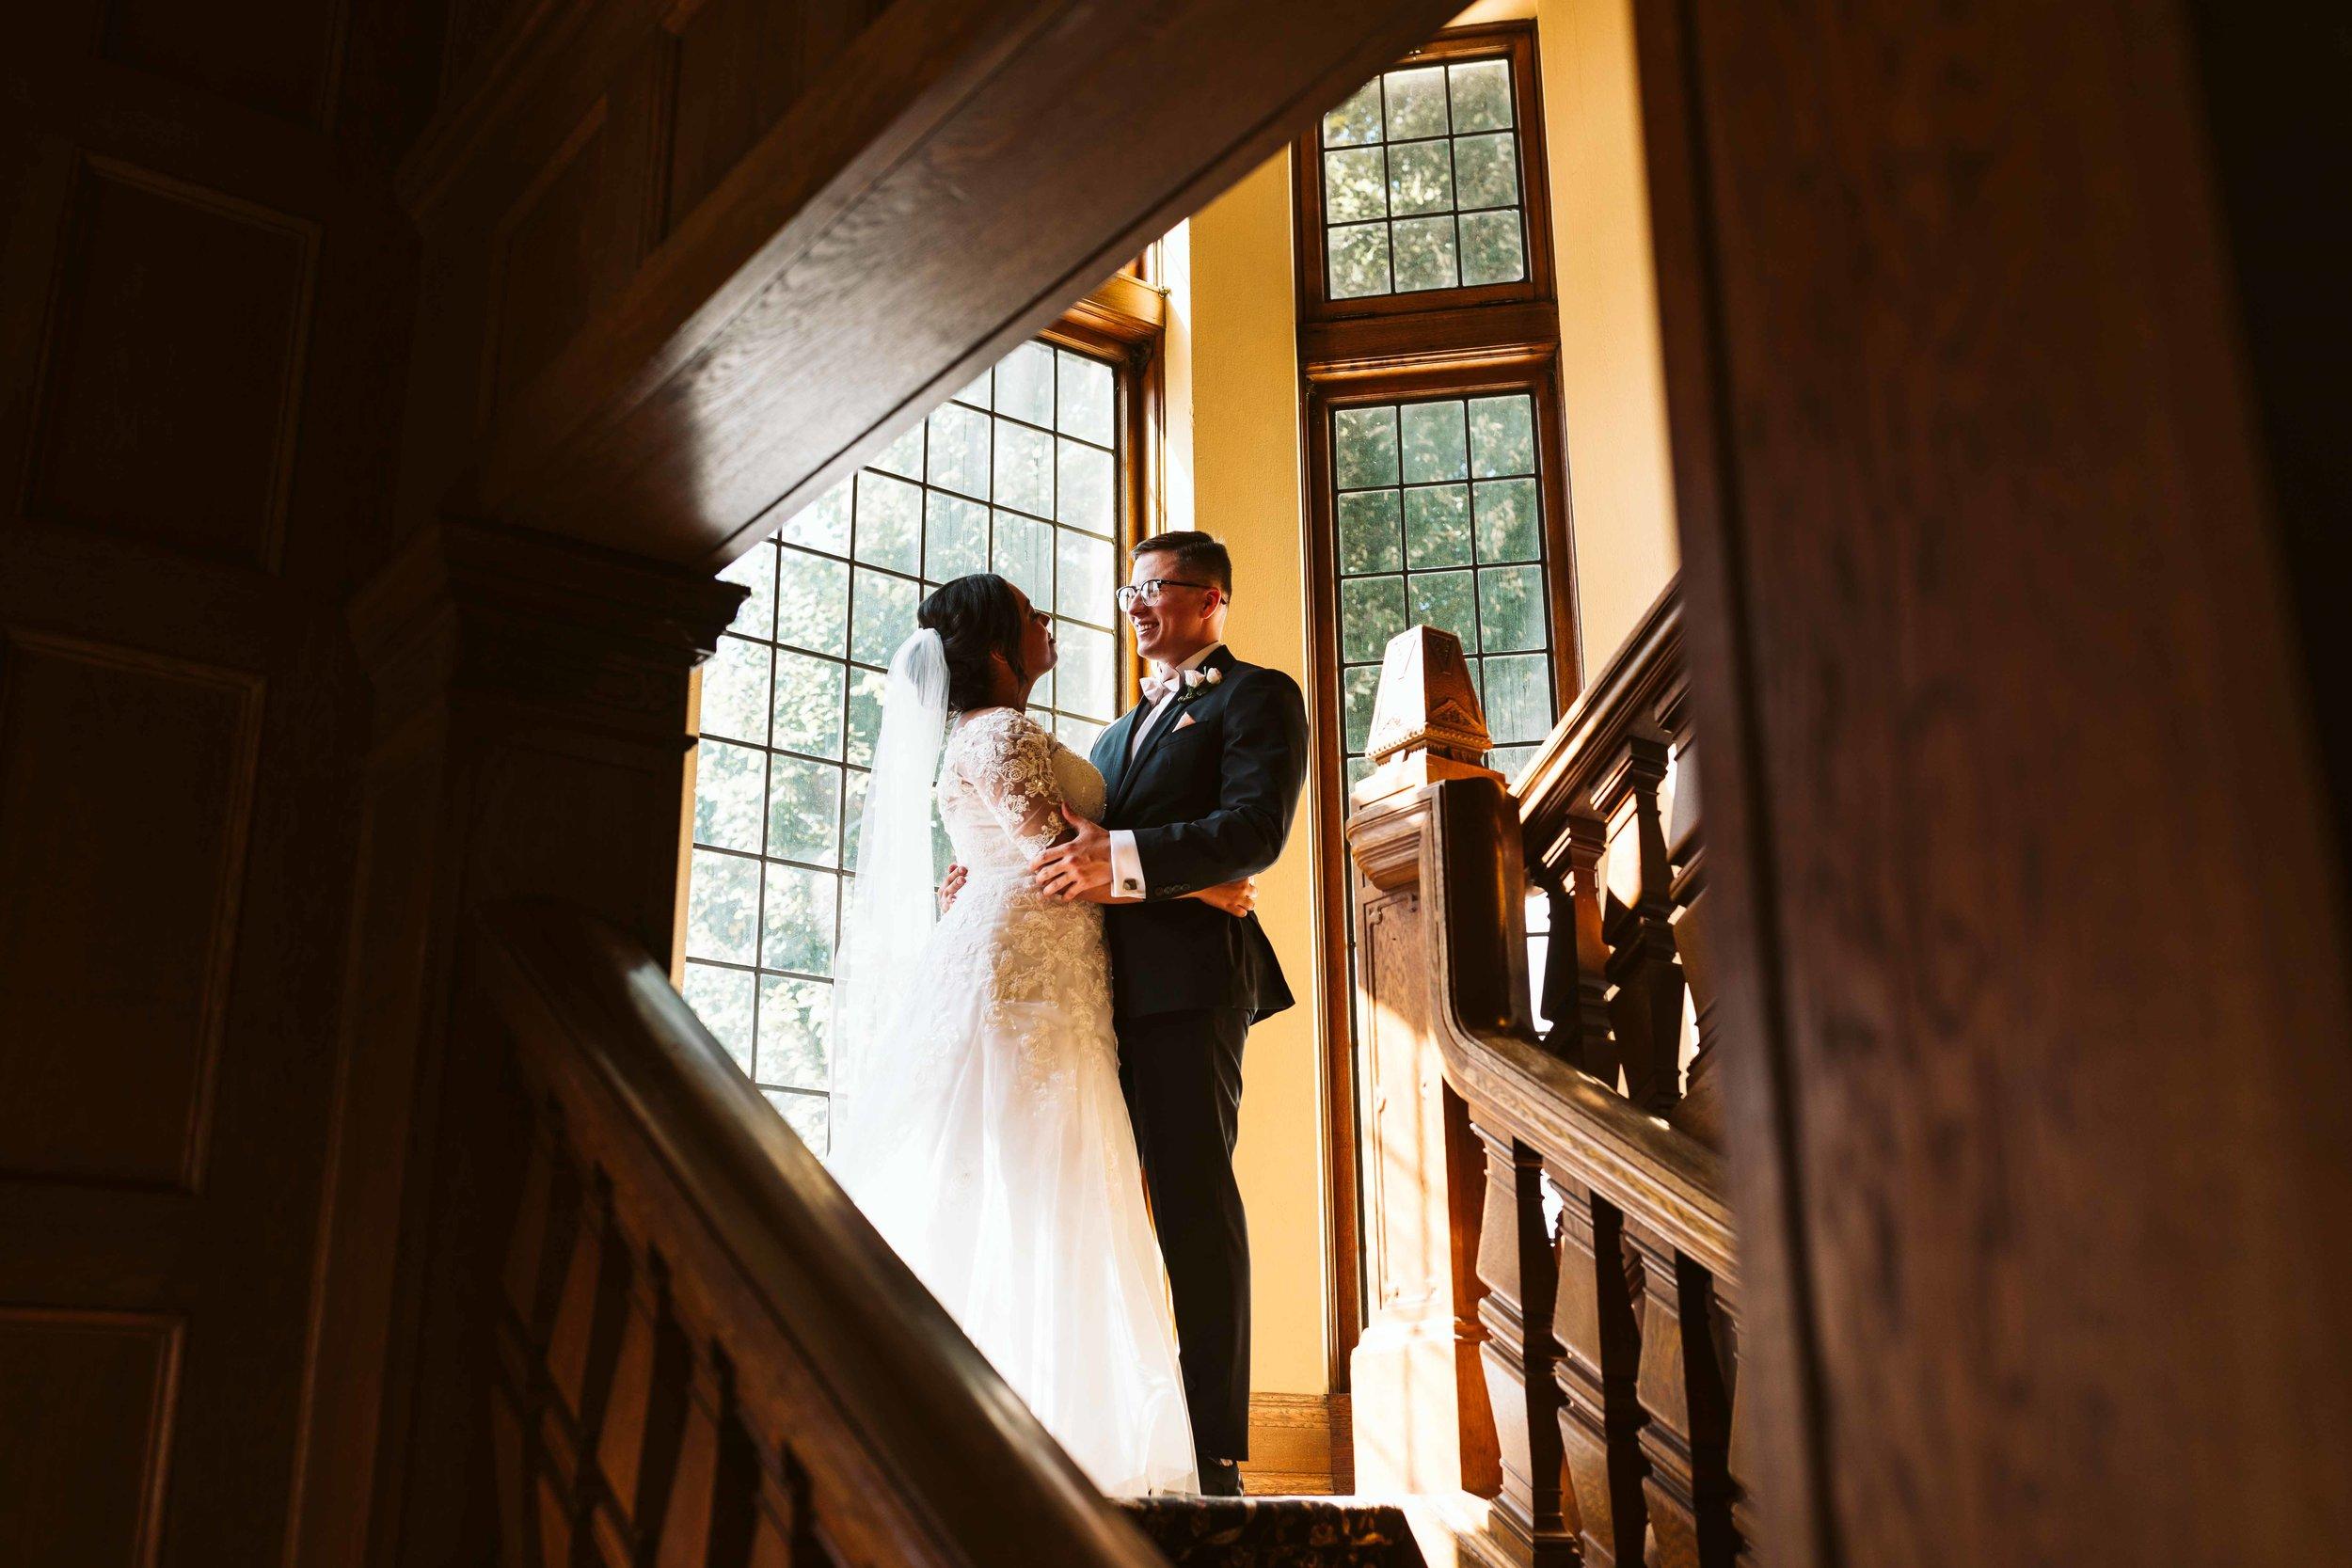 lairmont-manor-wedding-51.jpg